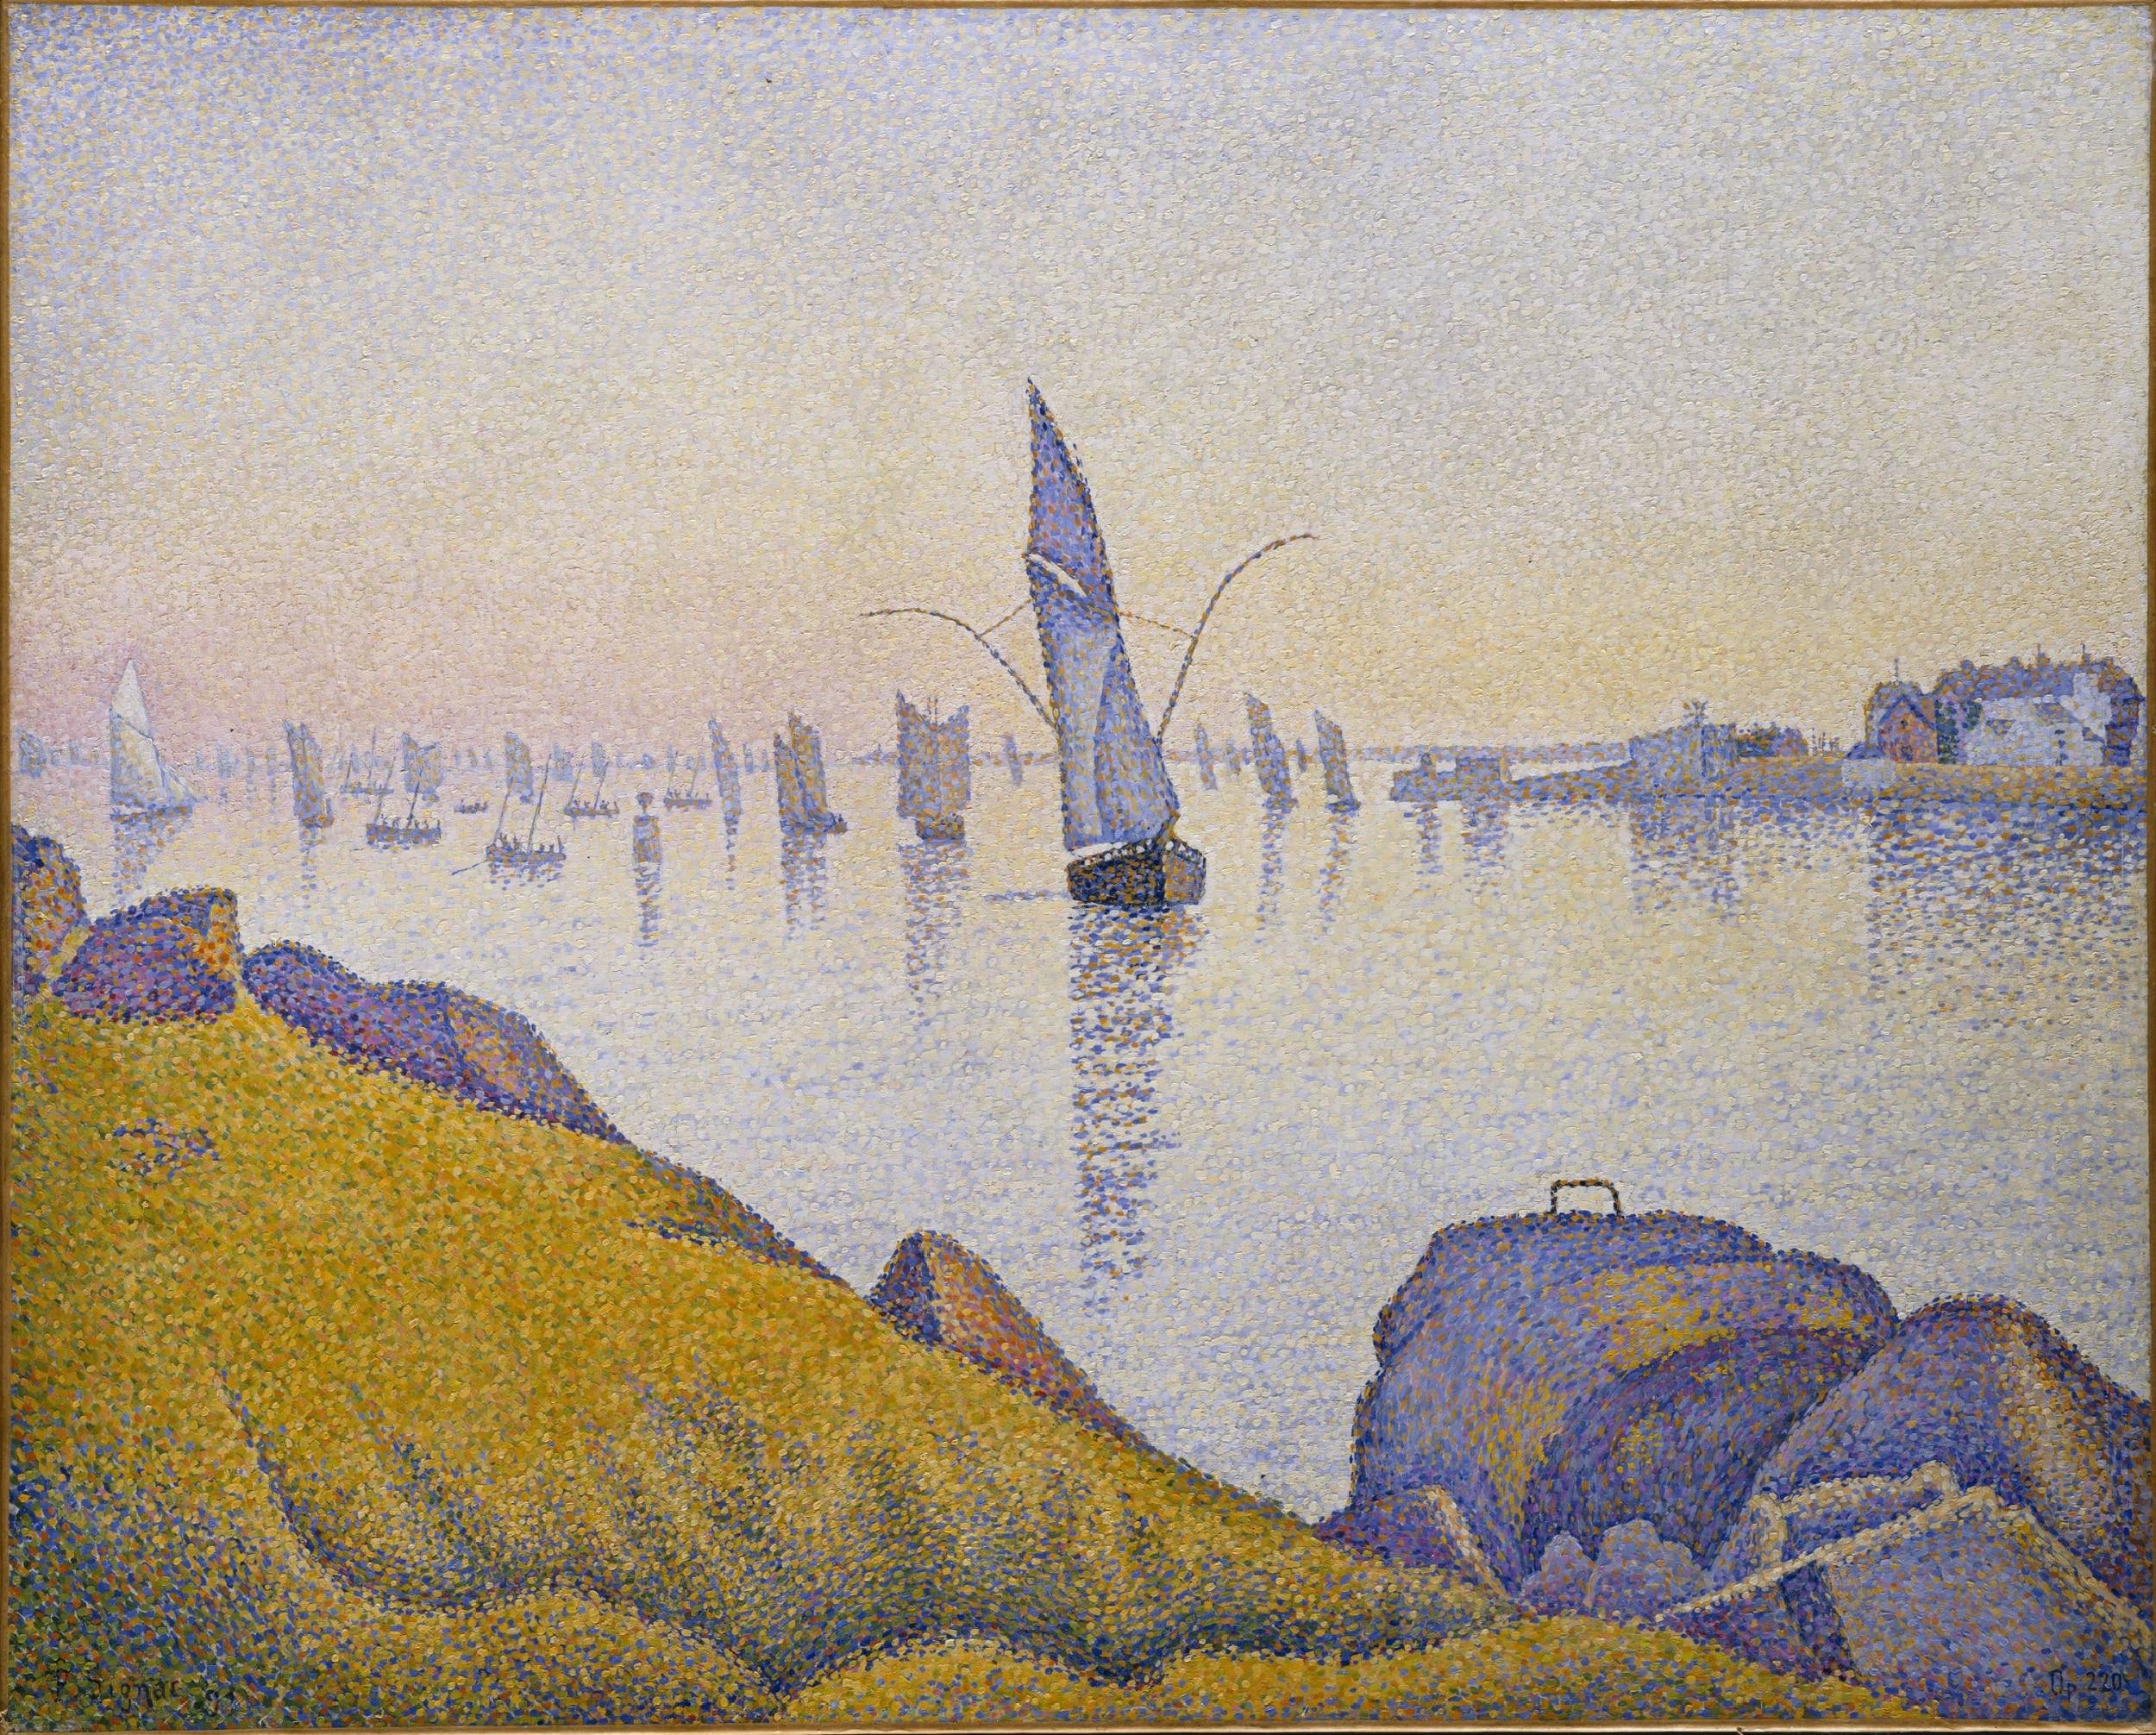 Paul Signac, Concarneau, calme du soir, opus 220 (Allegro Maestoso)